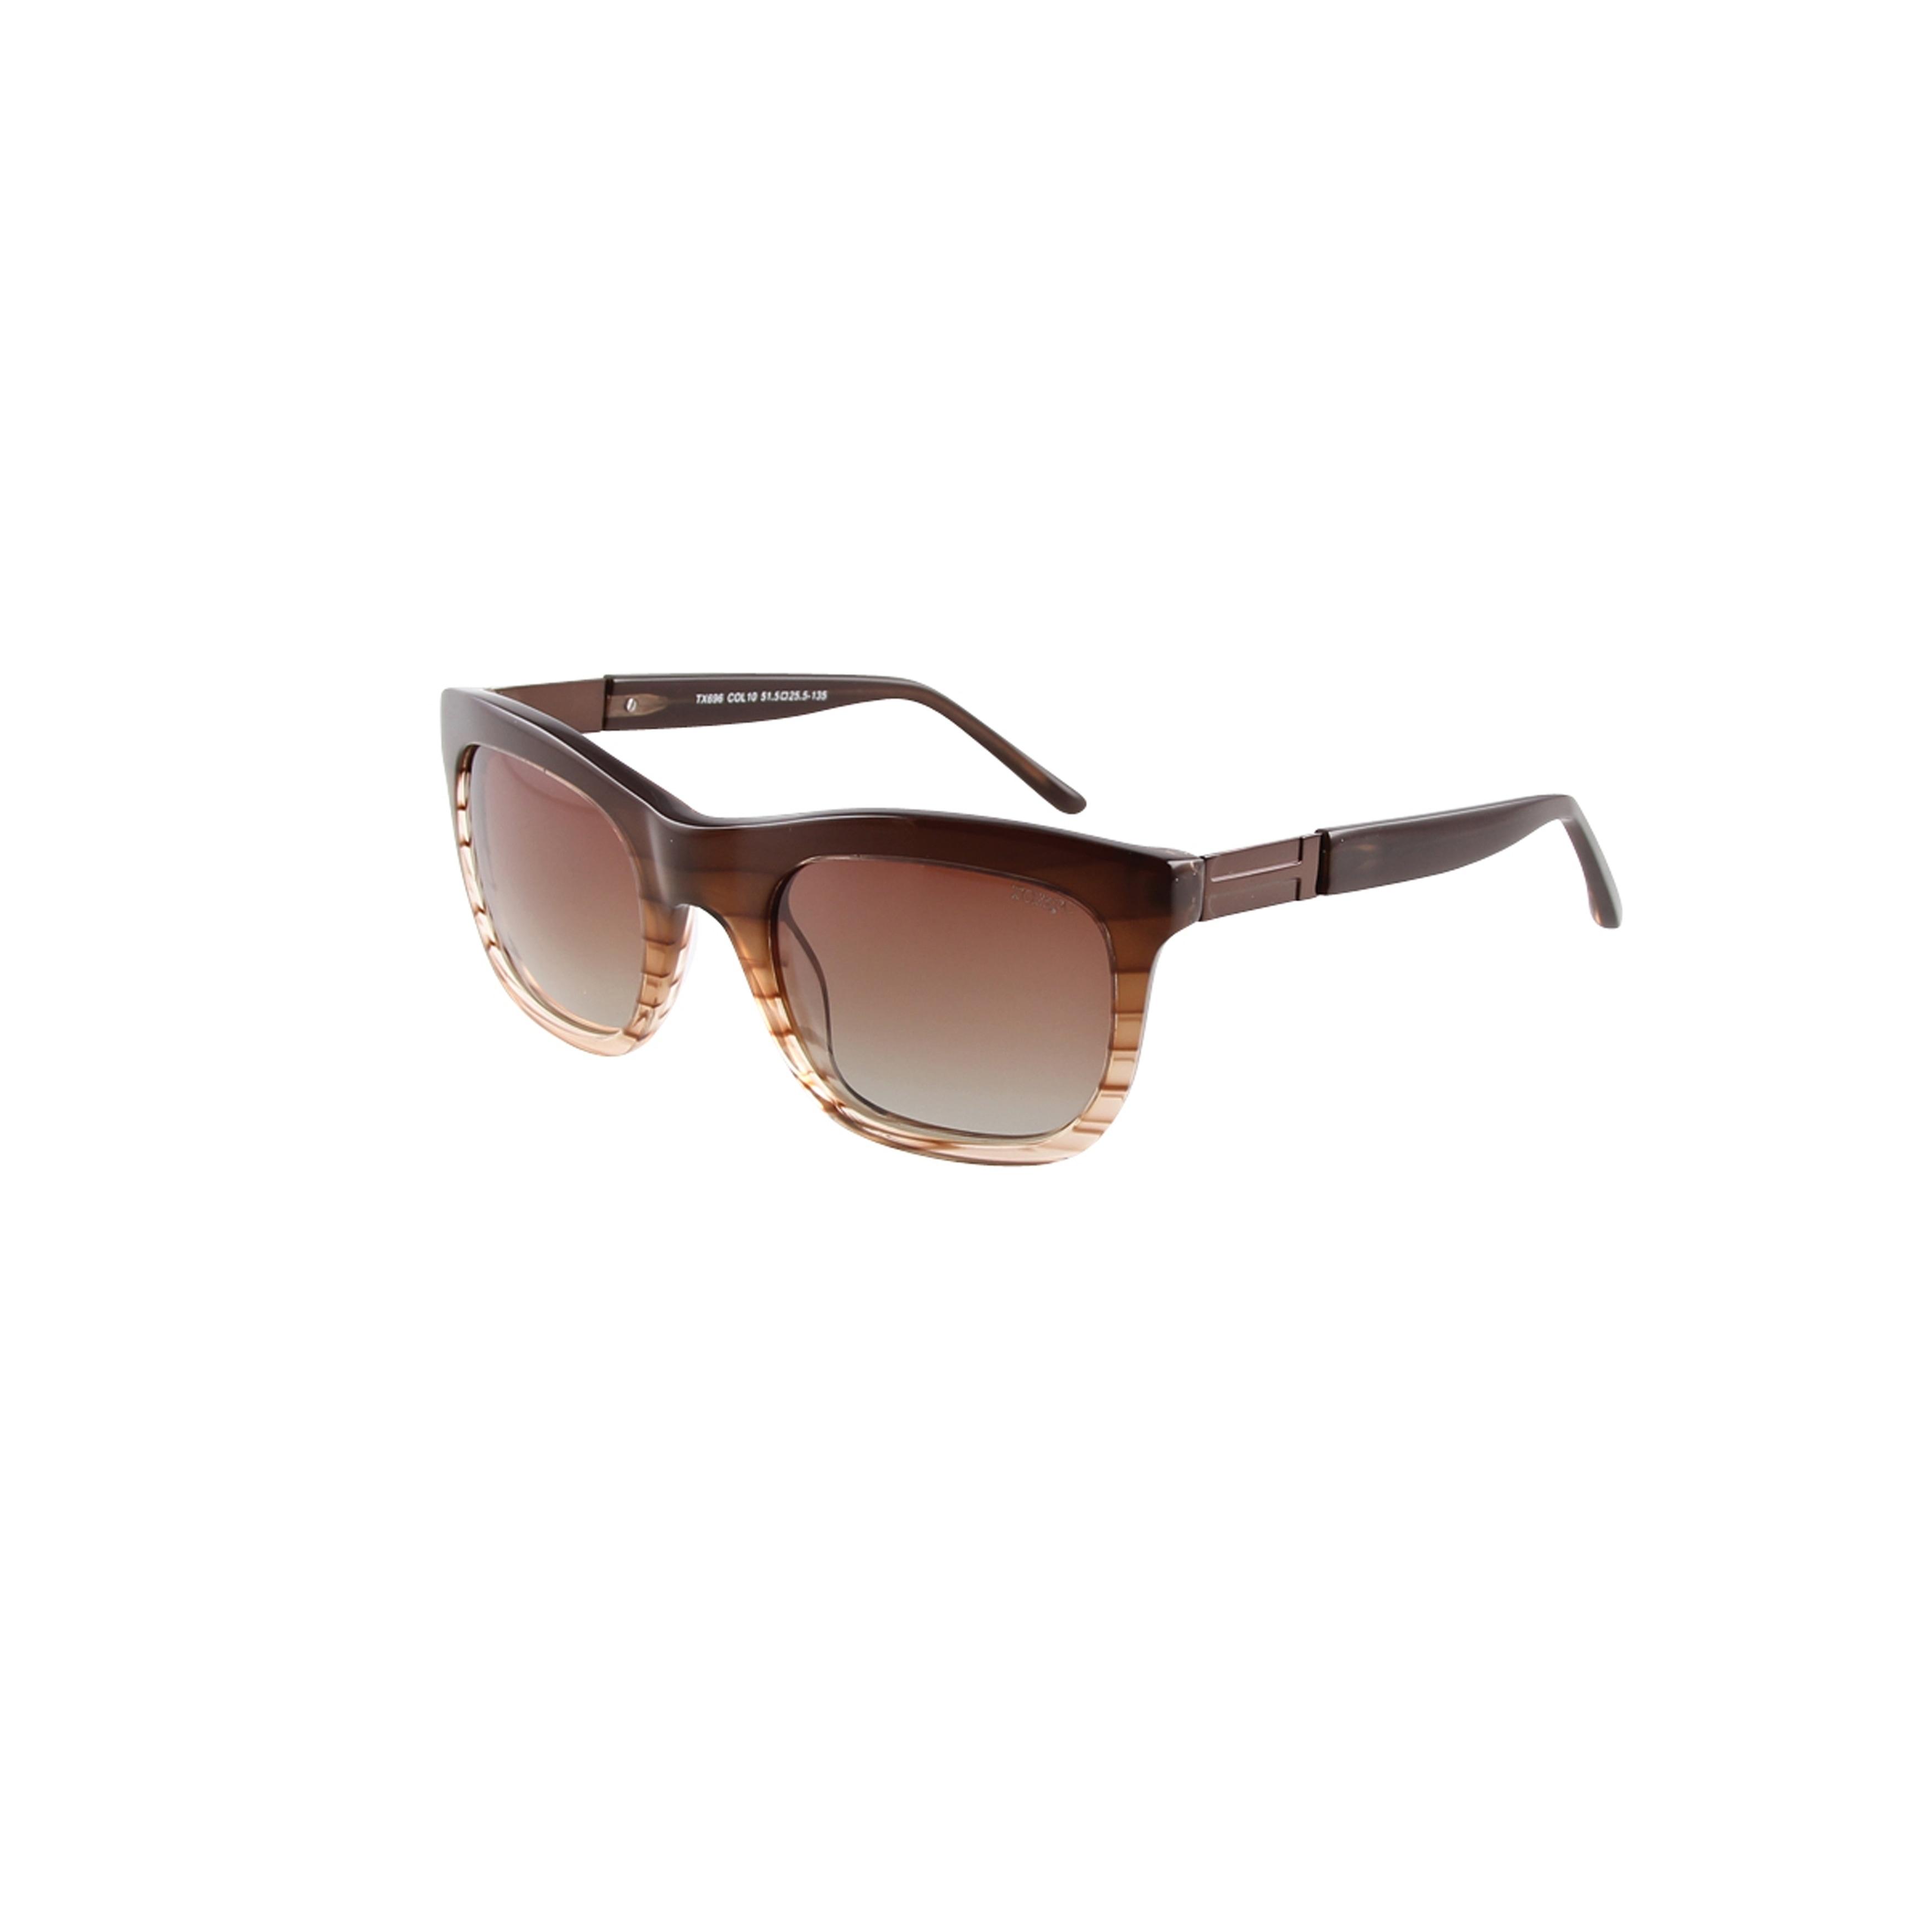 8878d560ce Shop Toxic Eyewear TX696-10 Brown Handmade Frame Brown Polarized lenses  Prescription adaptable - Free Shipping Today - Overstock - 17117744